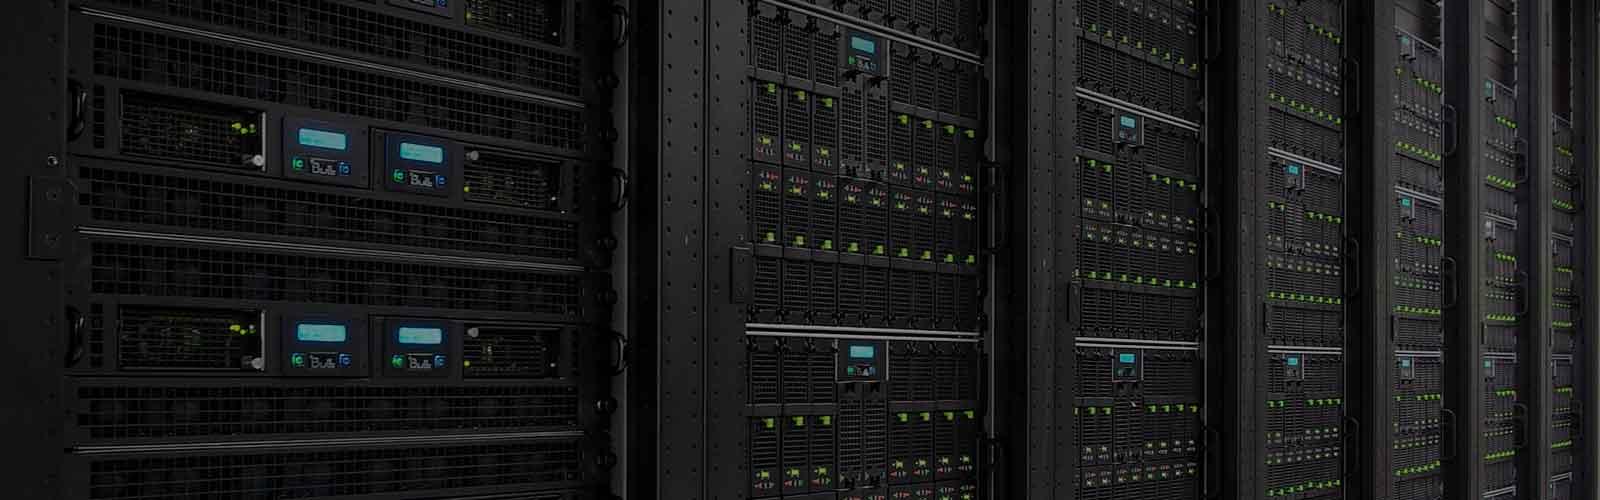 Unmanaged Dedicated Servers